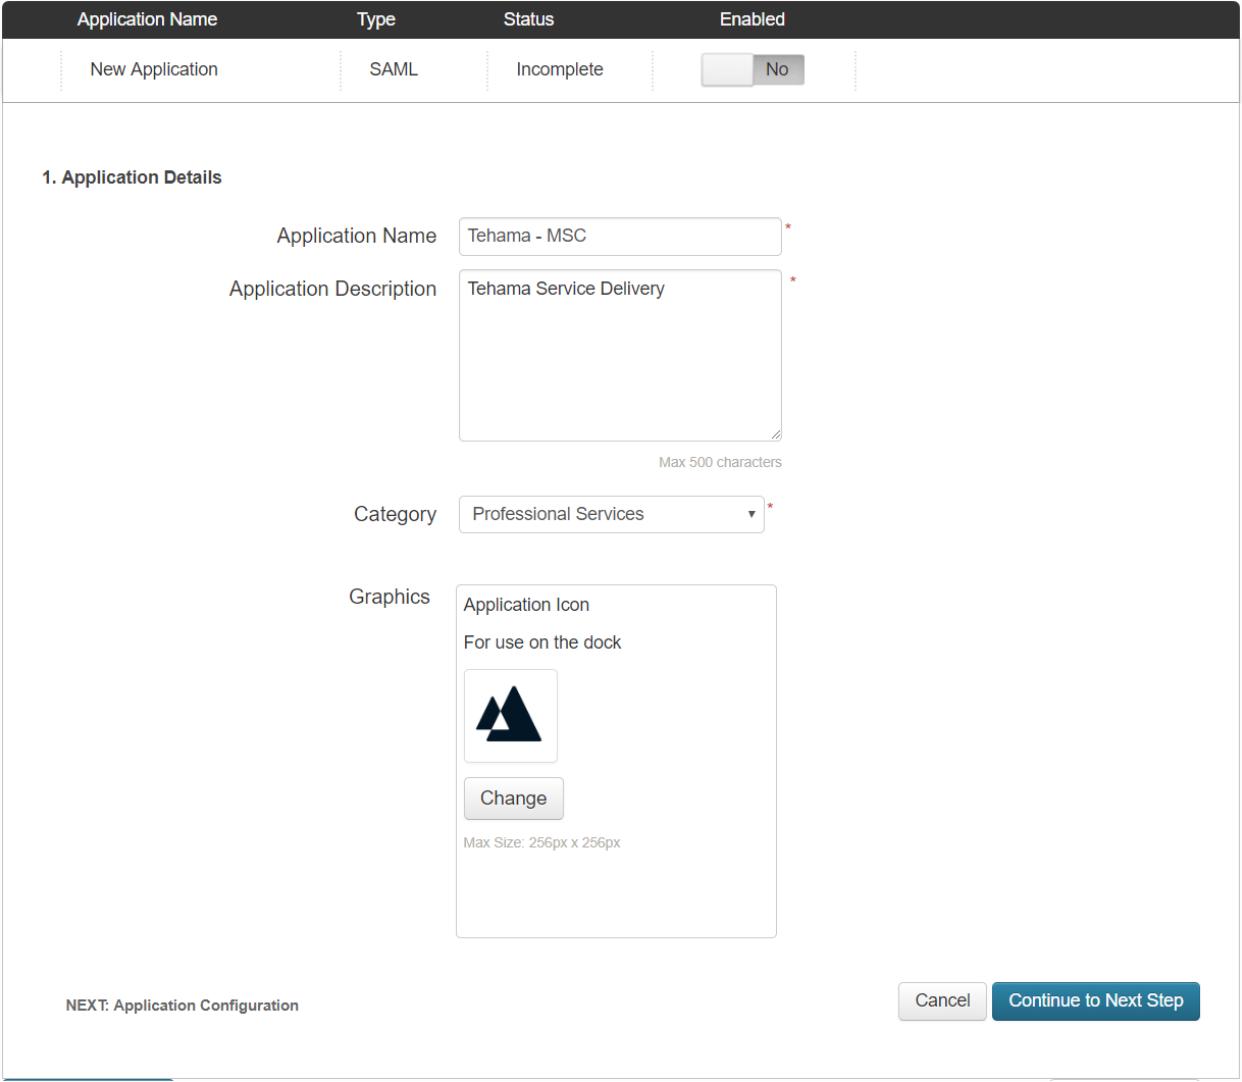 PingOne New SAML Application Page